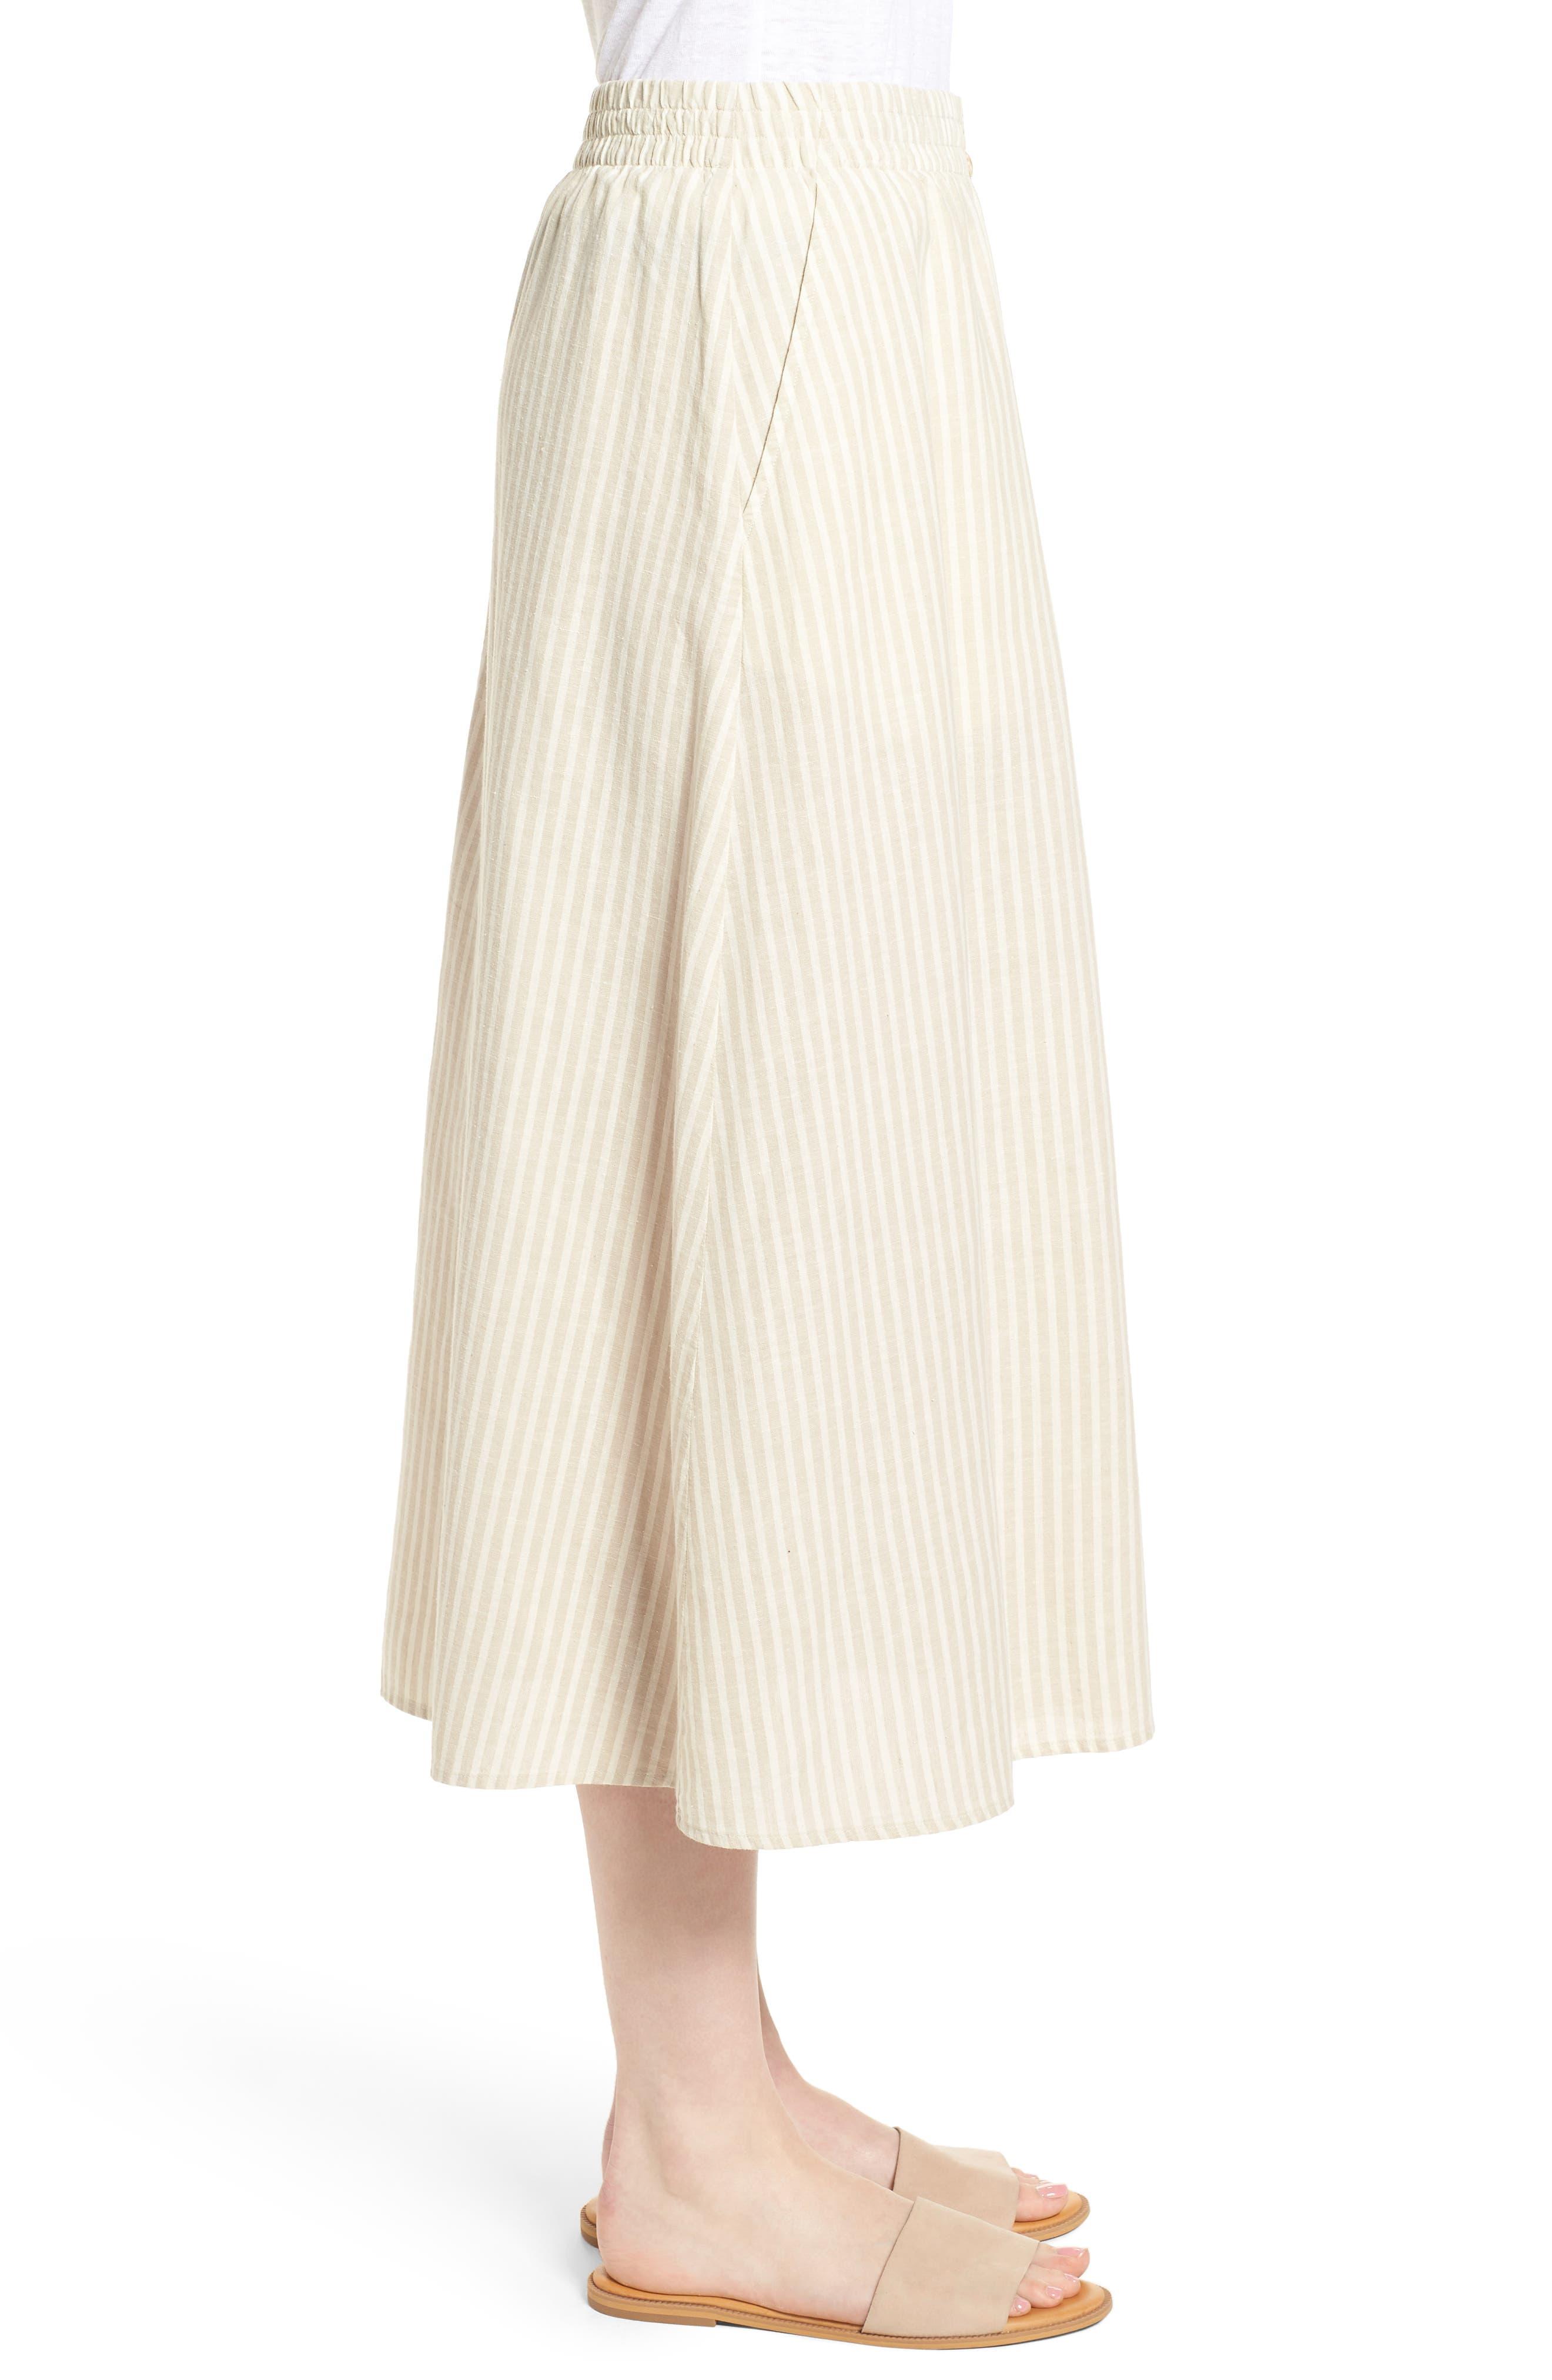 EILEEN FISHER,                             Stripe Hemp & Organic Cotton Midi Skirt,                             Alternate thumbnail 3, color,                             257